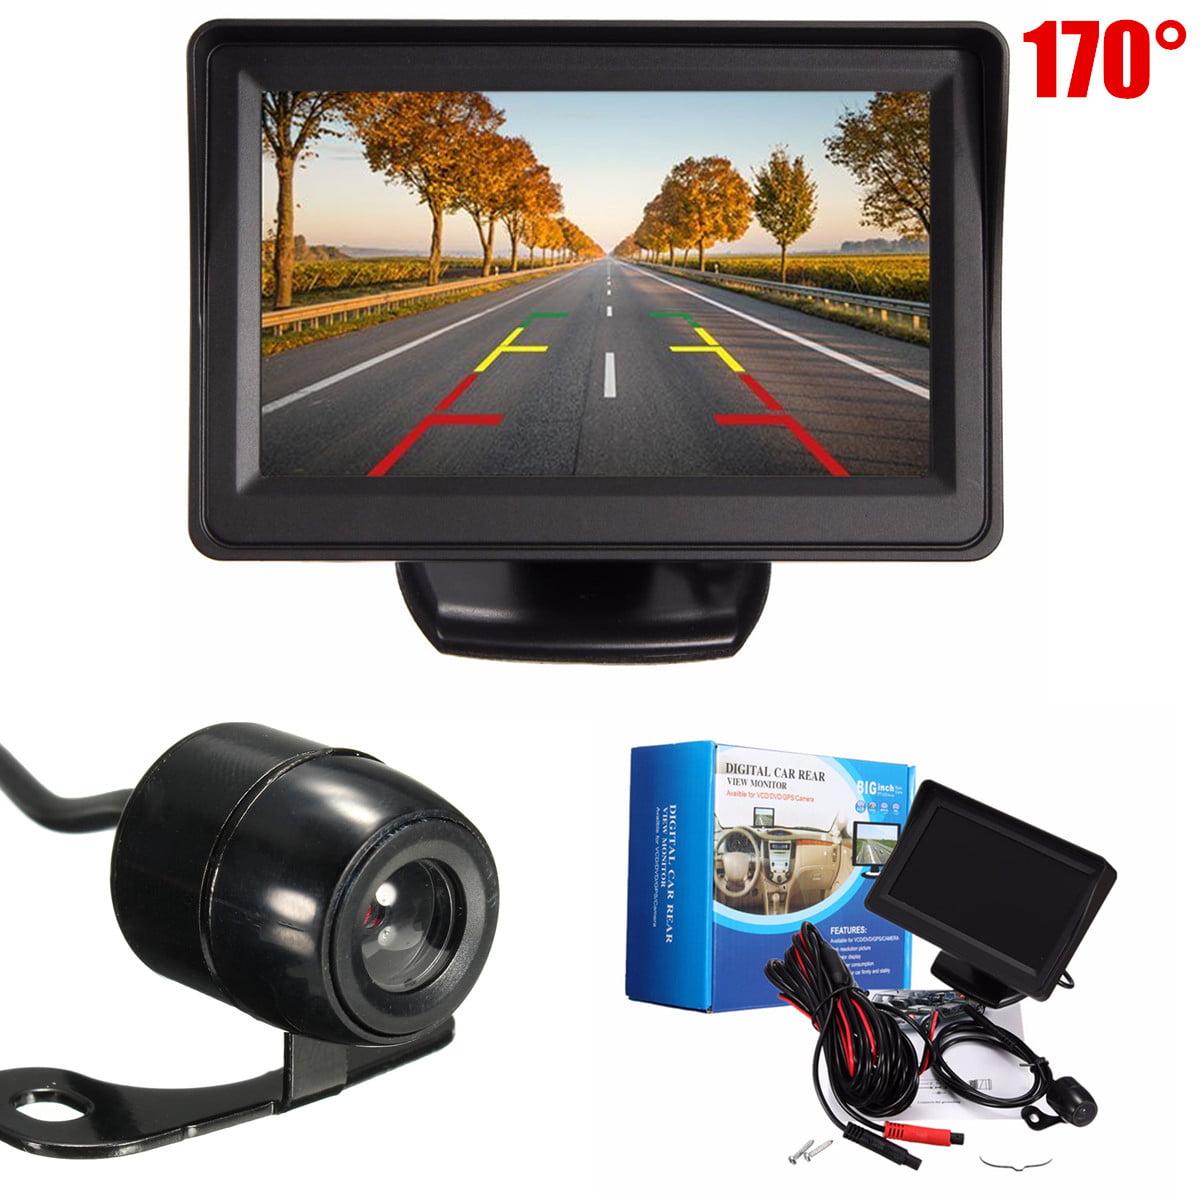 "12V-24V Car Truck Auto 4.3"" TFT LCD Monitor Video +170° 12V Night Vision CMOS Car Reverse Back Up Rear View Parking Camera Kit"